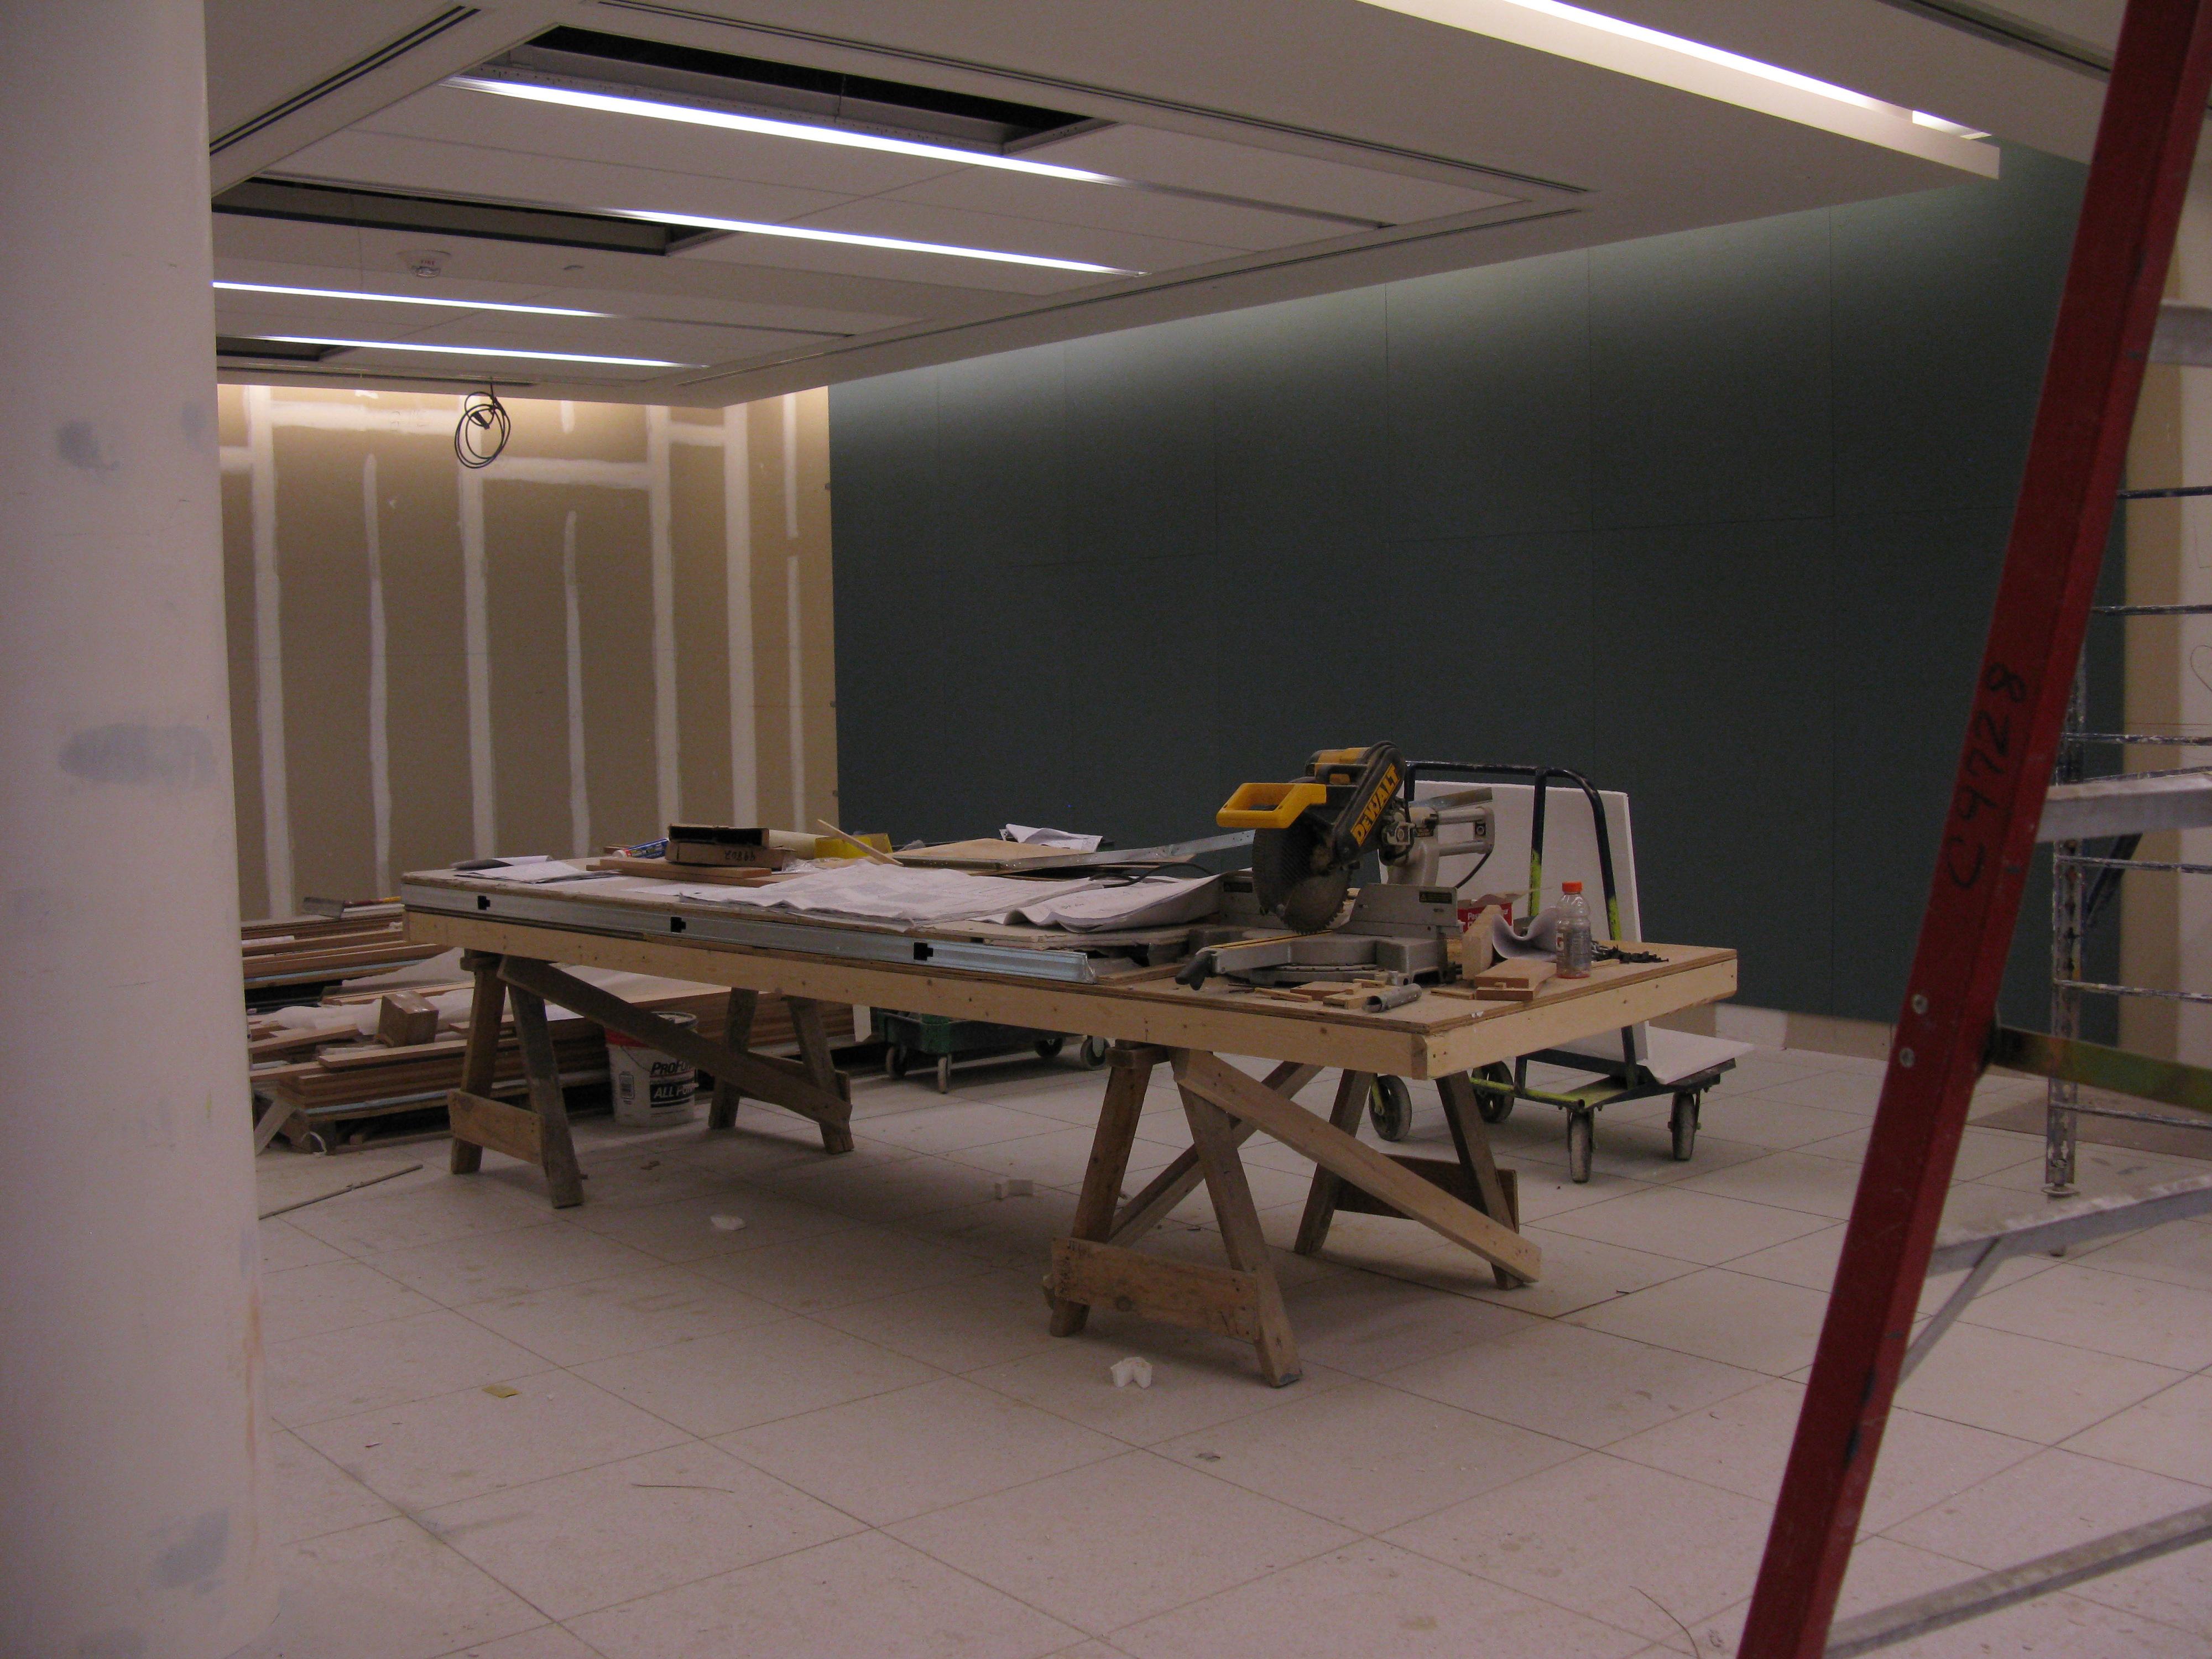 Image Result For Tile And Hardwood Floor Designsa